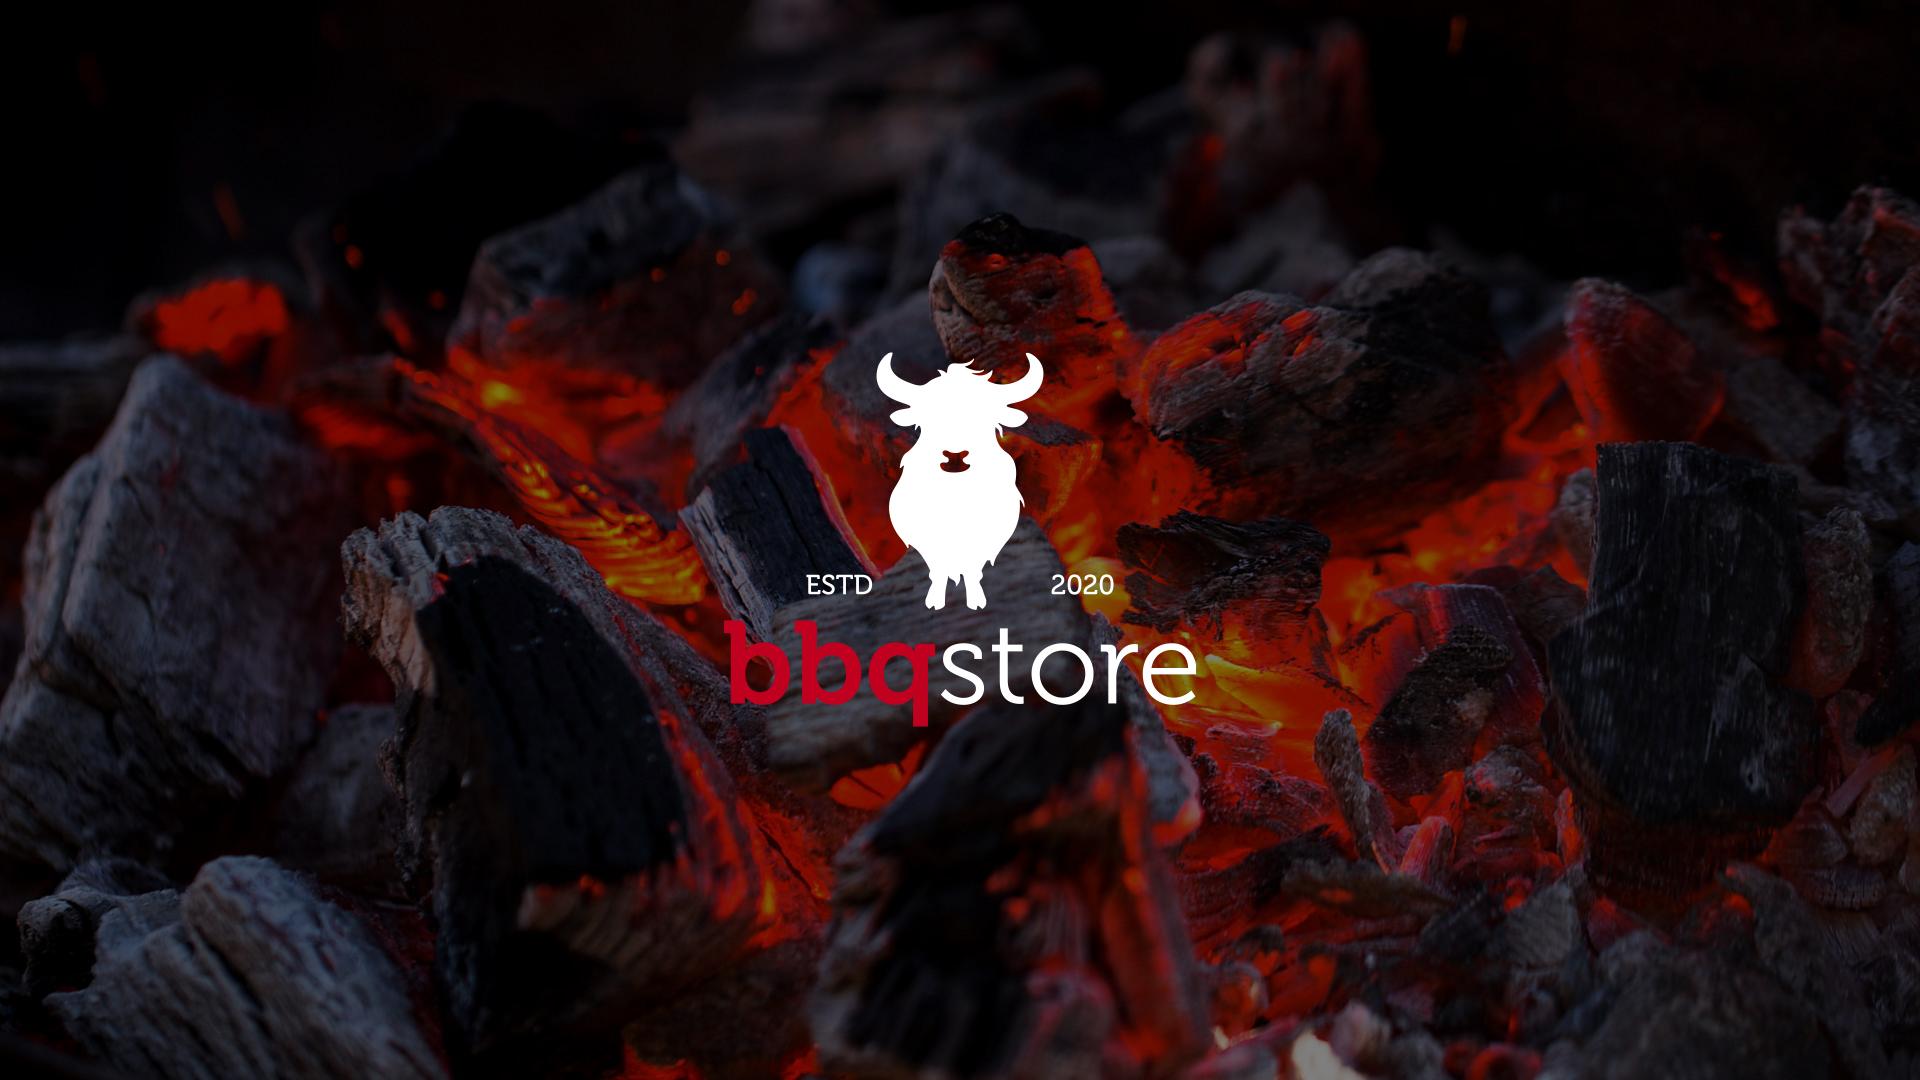 Digital Factory Creates BBQ Store Branding, BBQstore